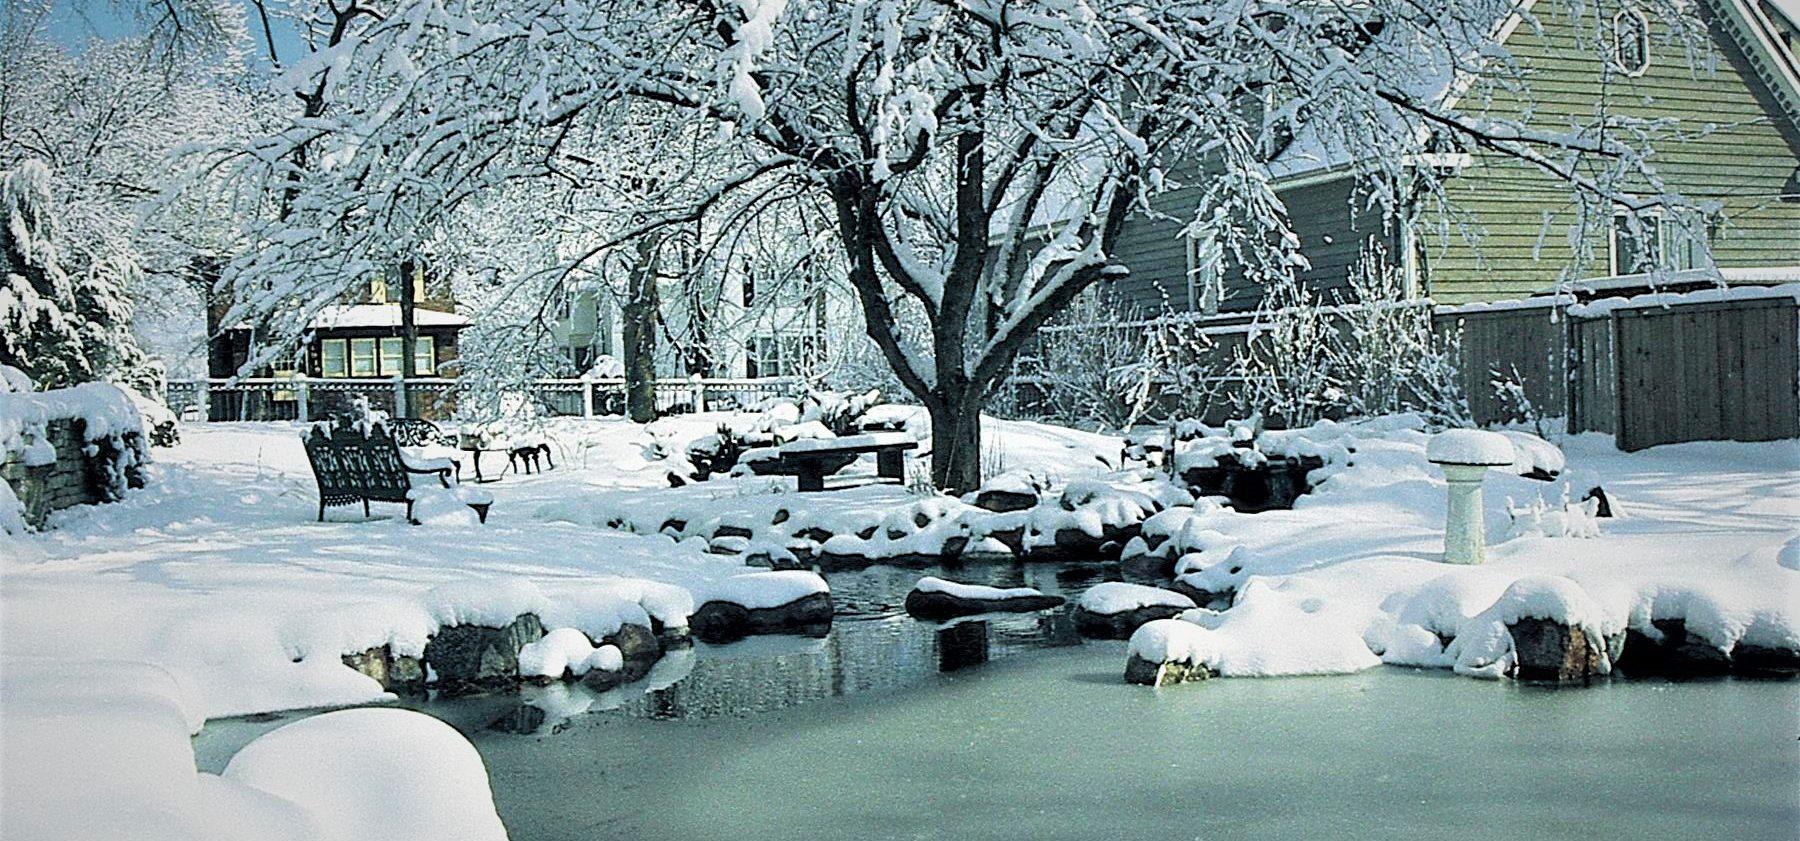 backyard pond in snow